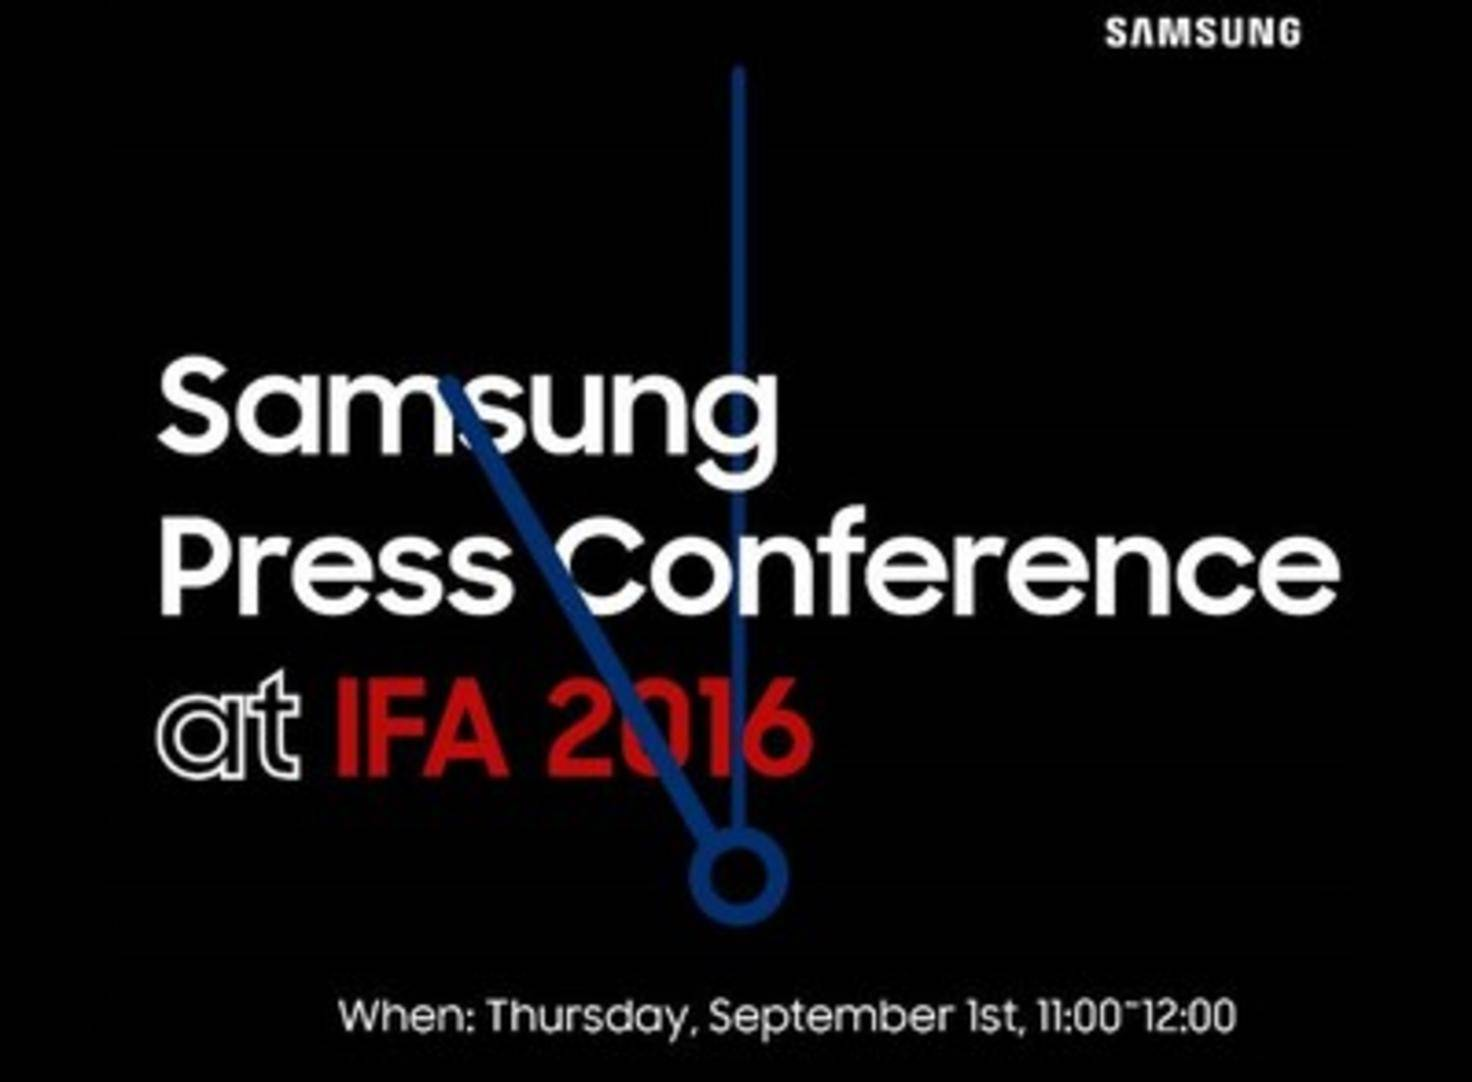 Samsung IFA Pressekonferenz Engadget